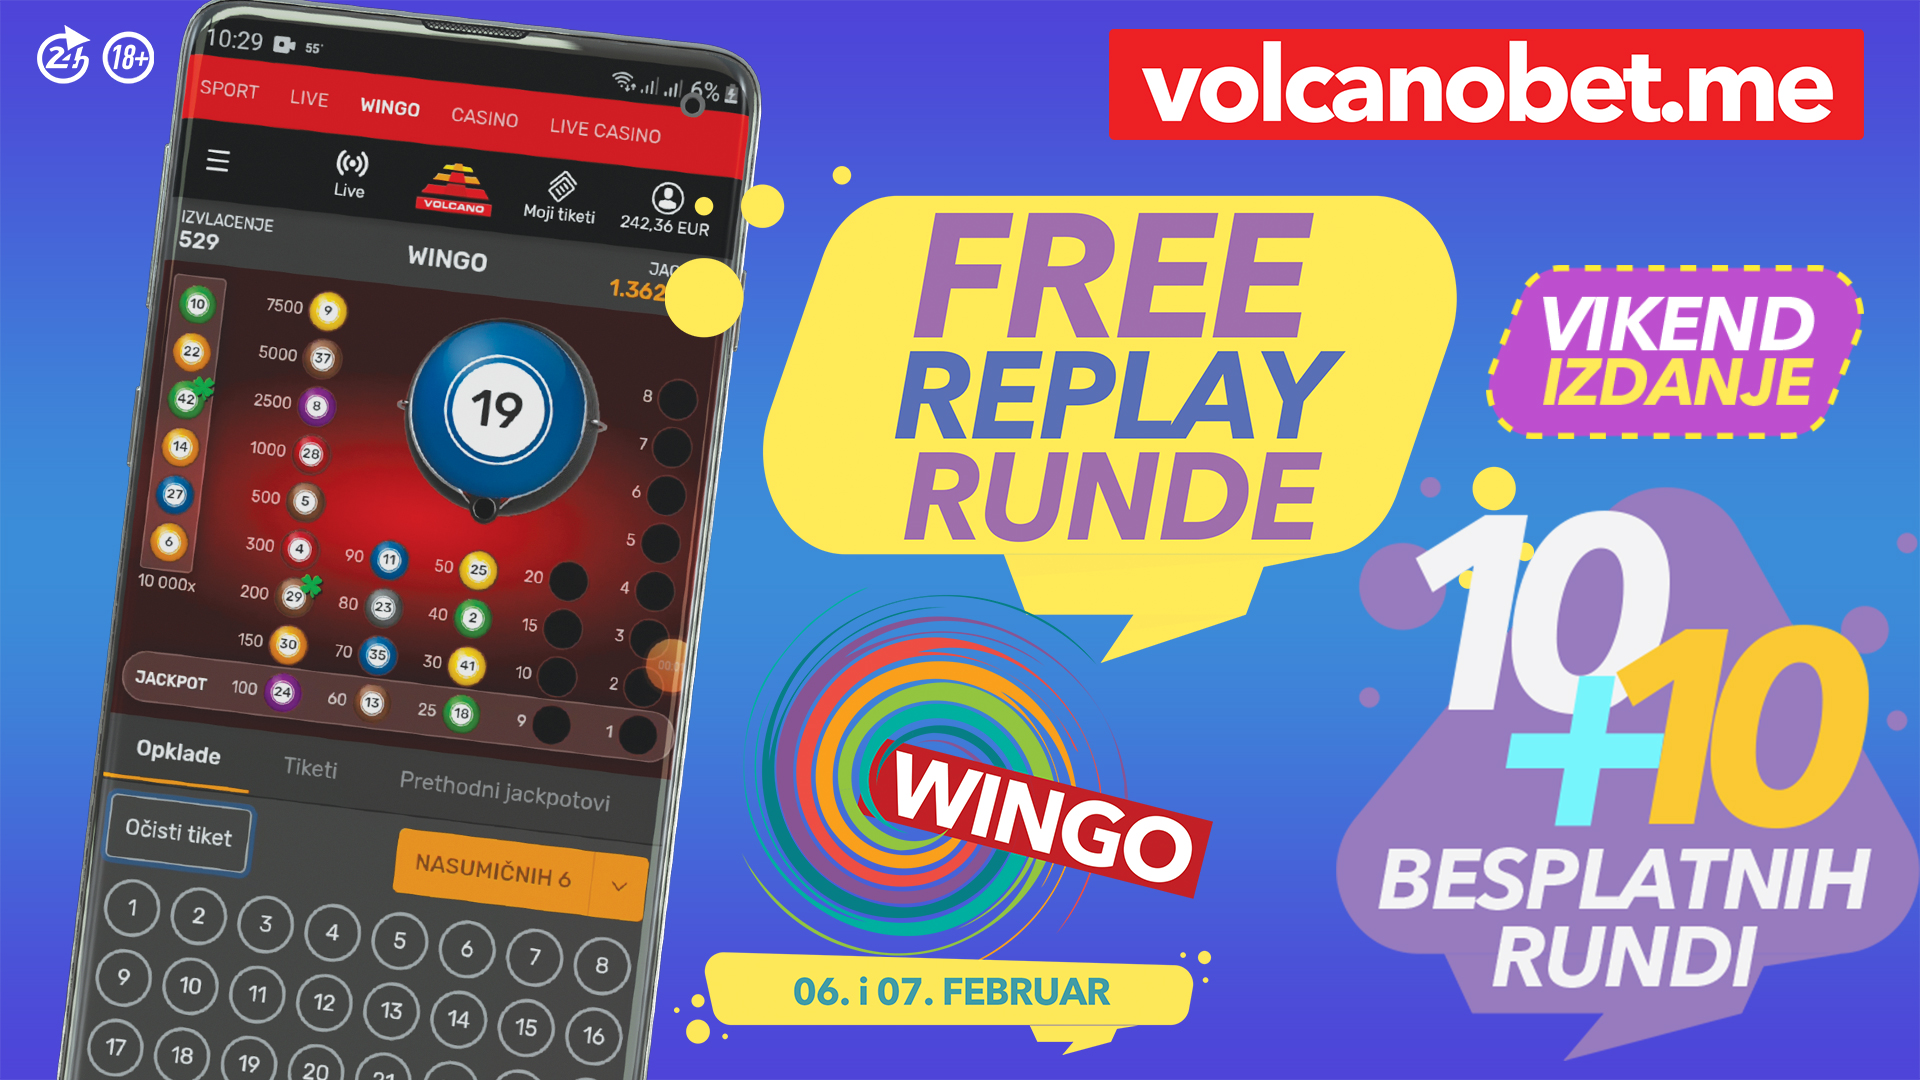 Free Replay